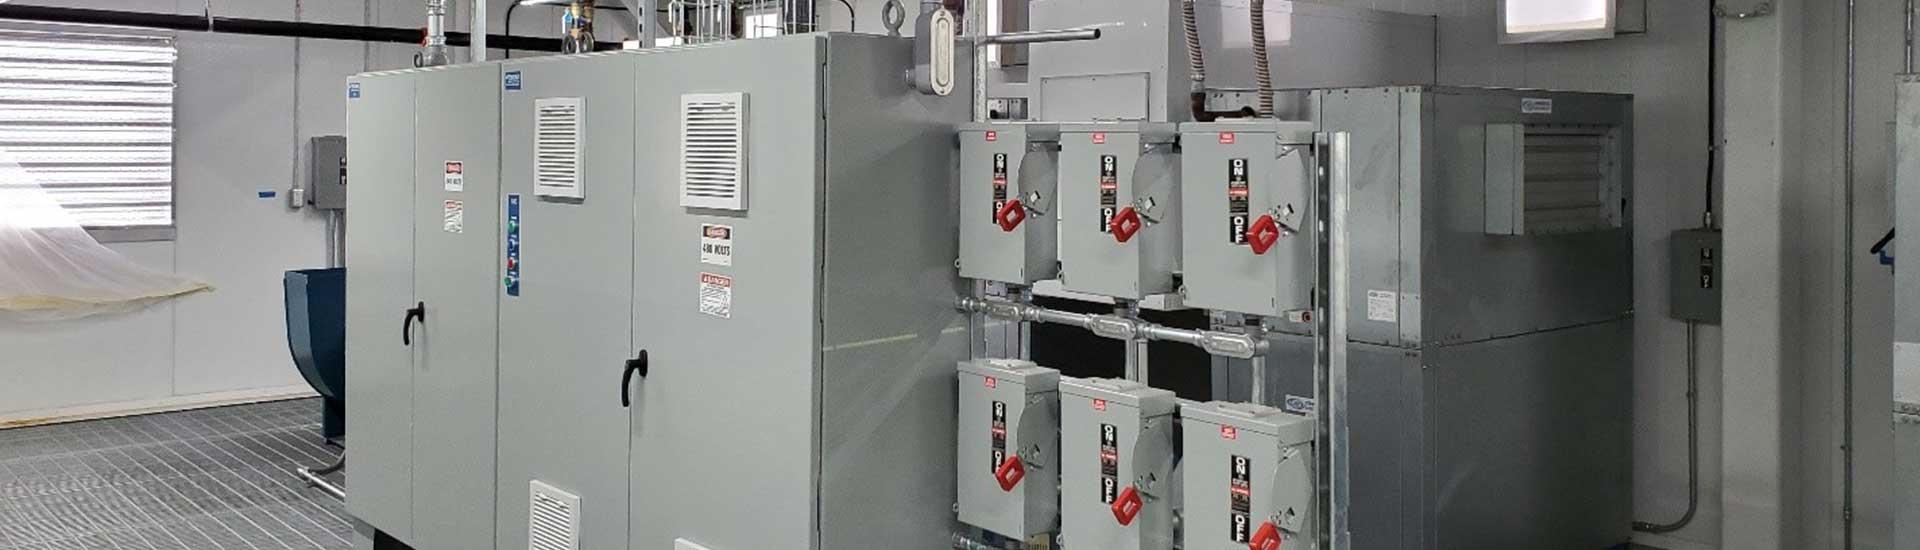 Electrical Switchgear in Dallas, Arlington, TX, Burleson, Fort Worth